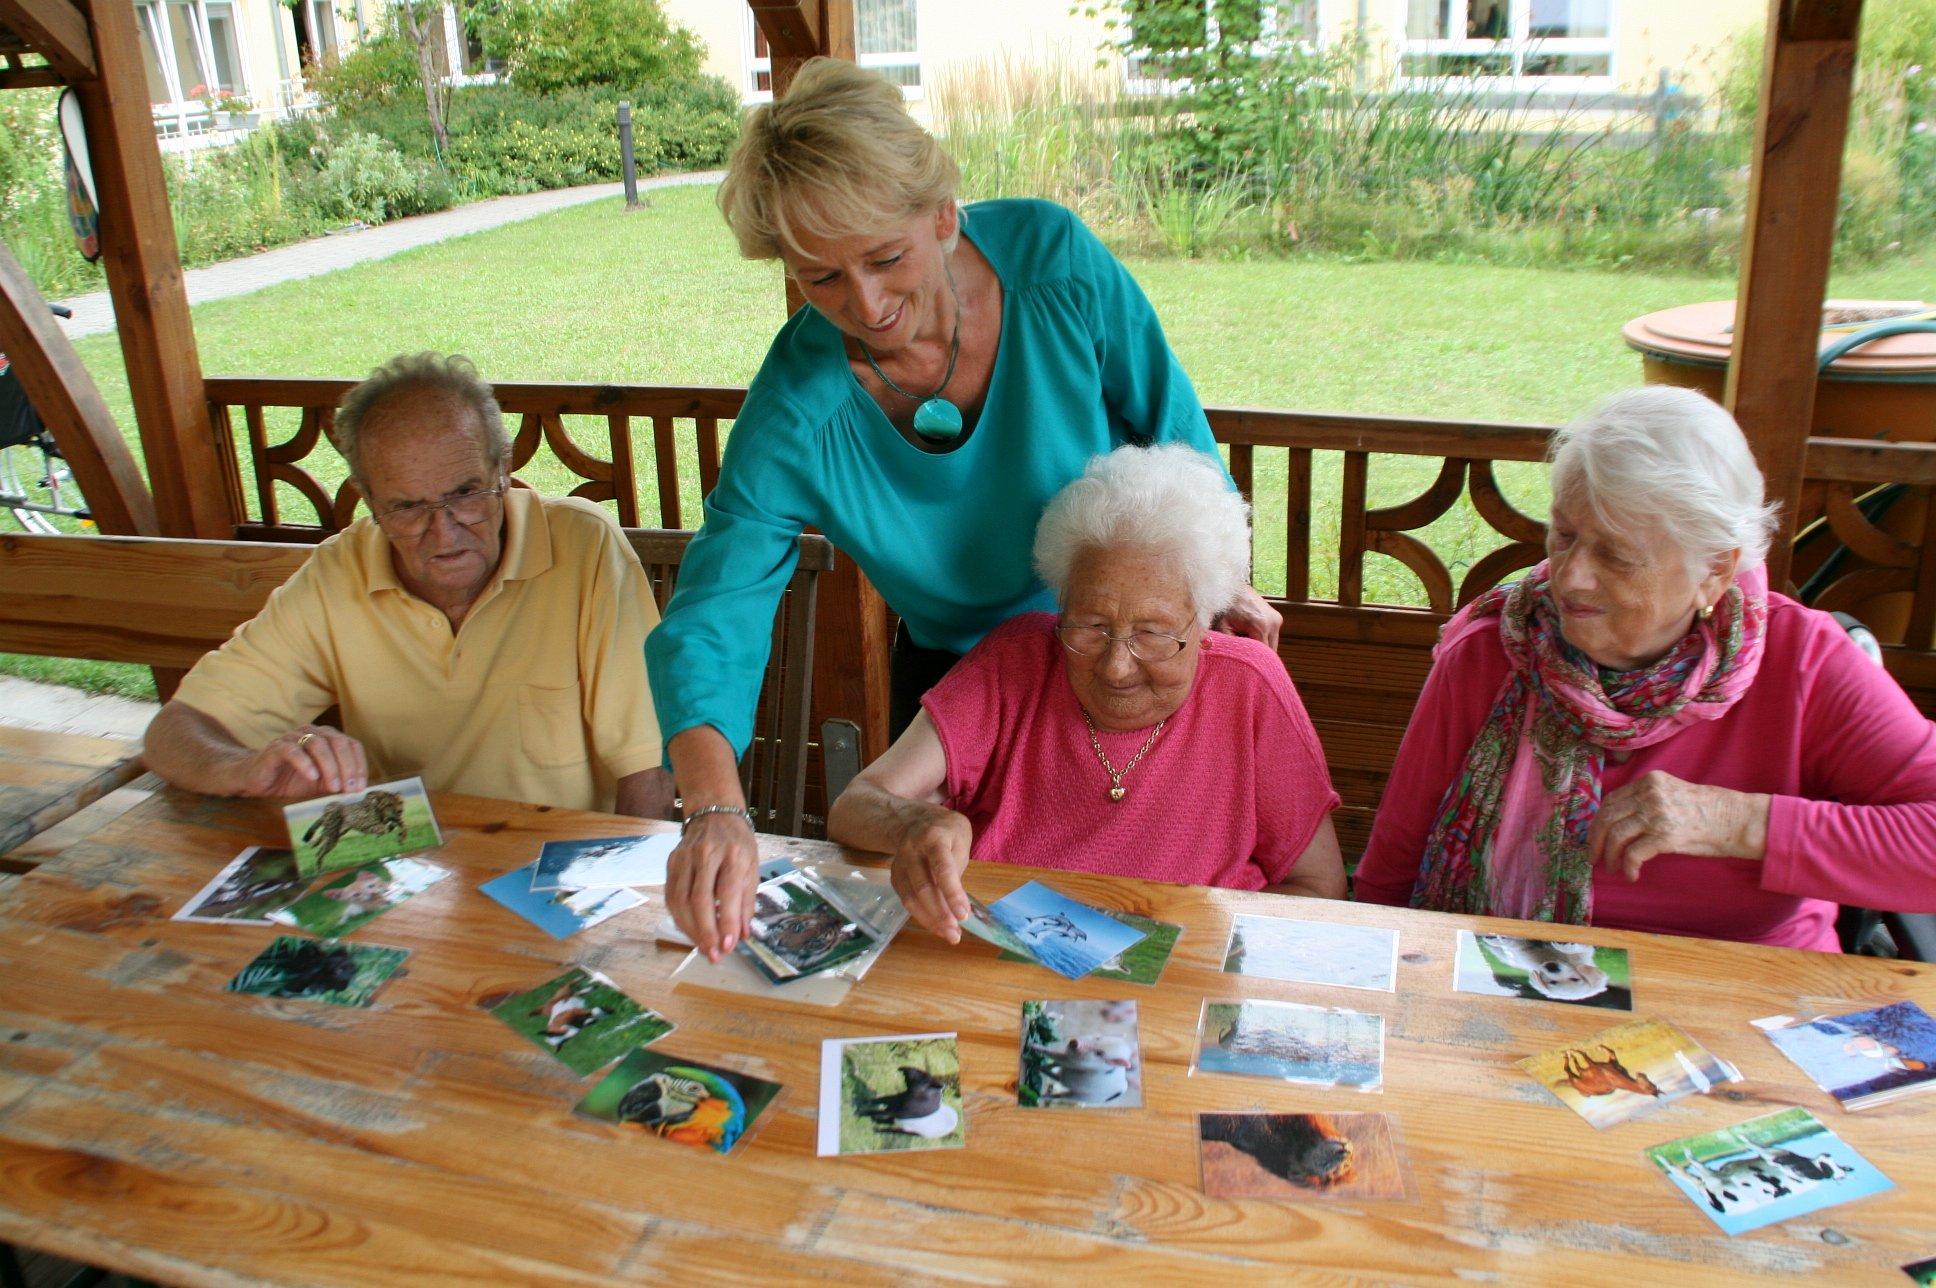 seniorenbetreuung-muenchen-lebensfreude-66-plus-bilder-erkennen